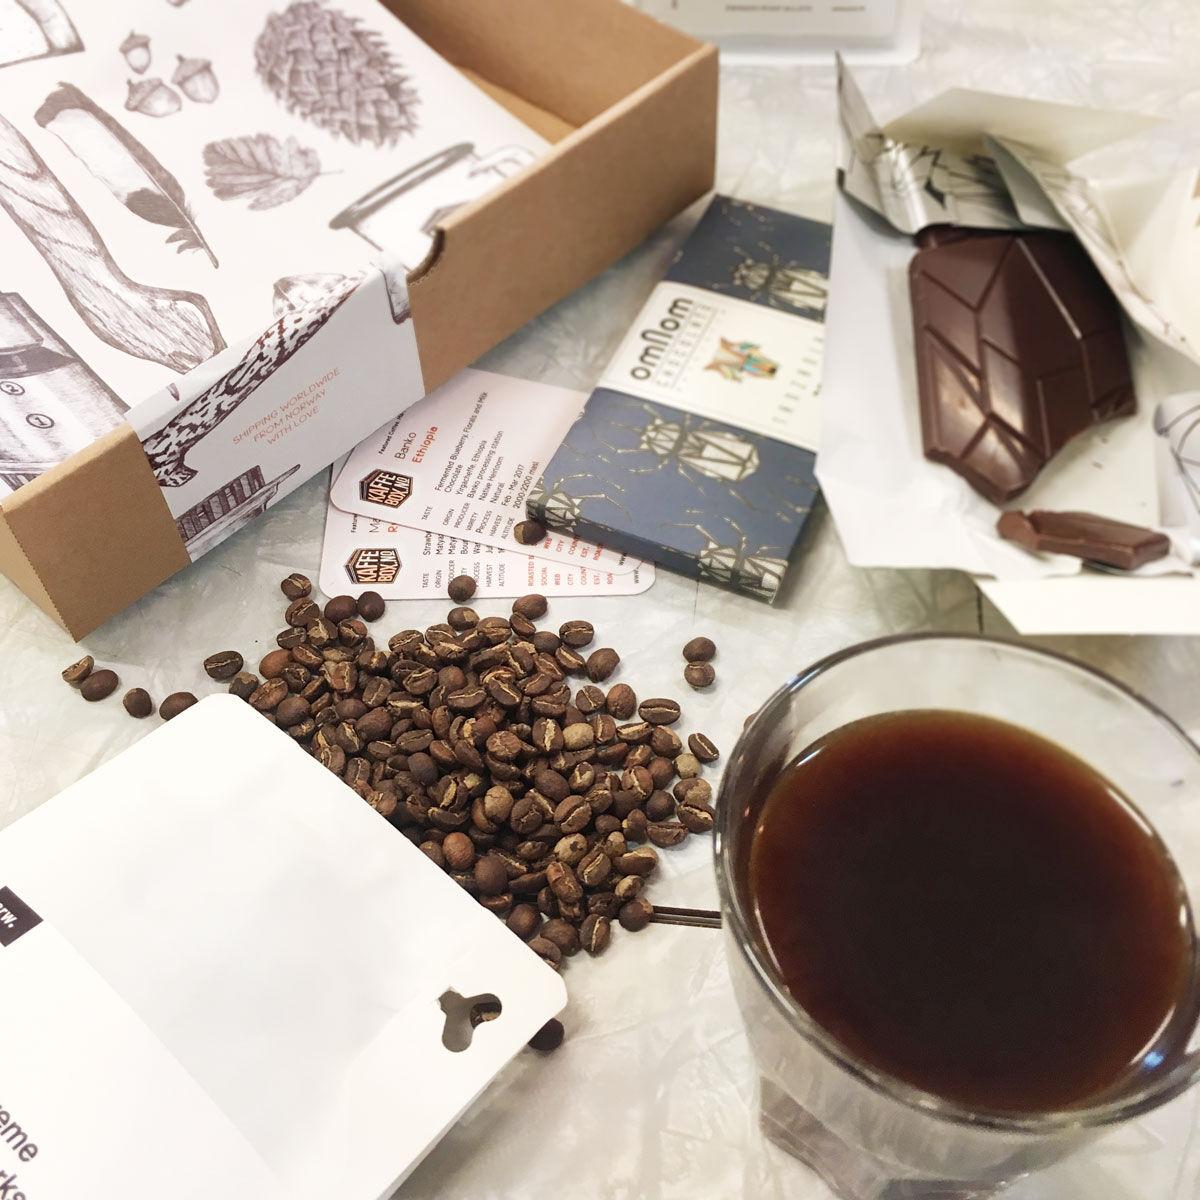 KaffeBox Chocolate Pairing Subscription - 750g, 4 bars